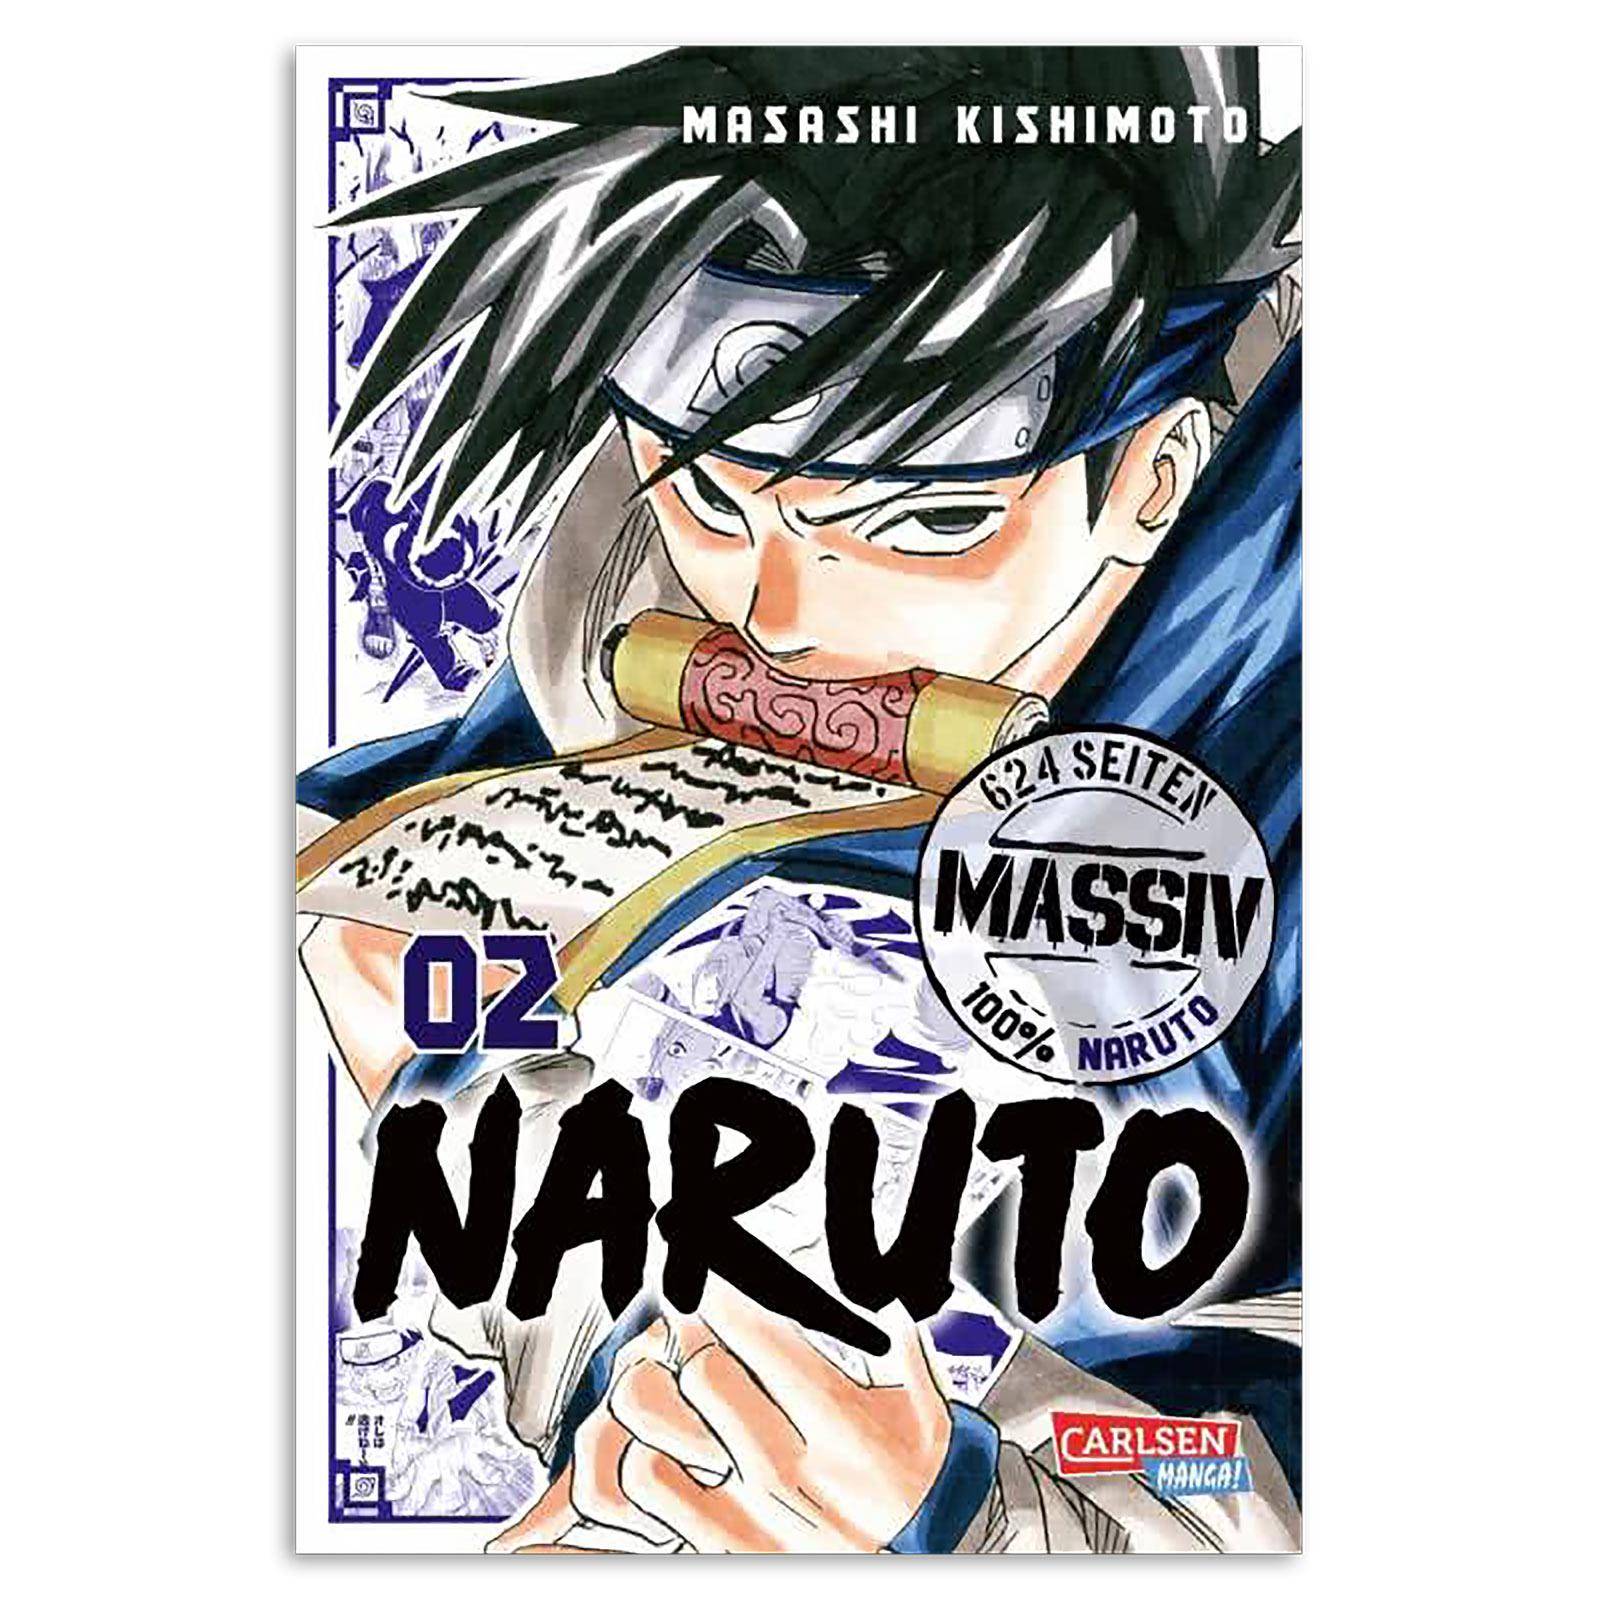 Naruto - Sammelband 2 Taschenbuch